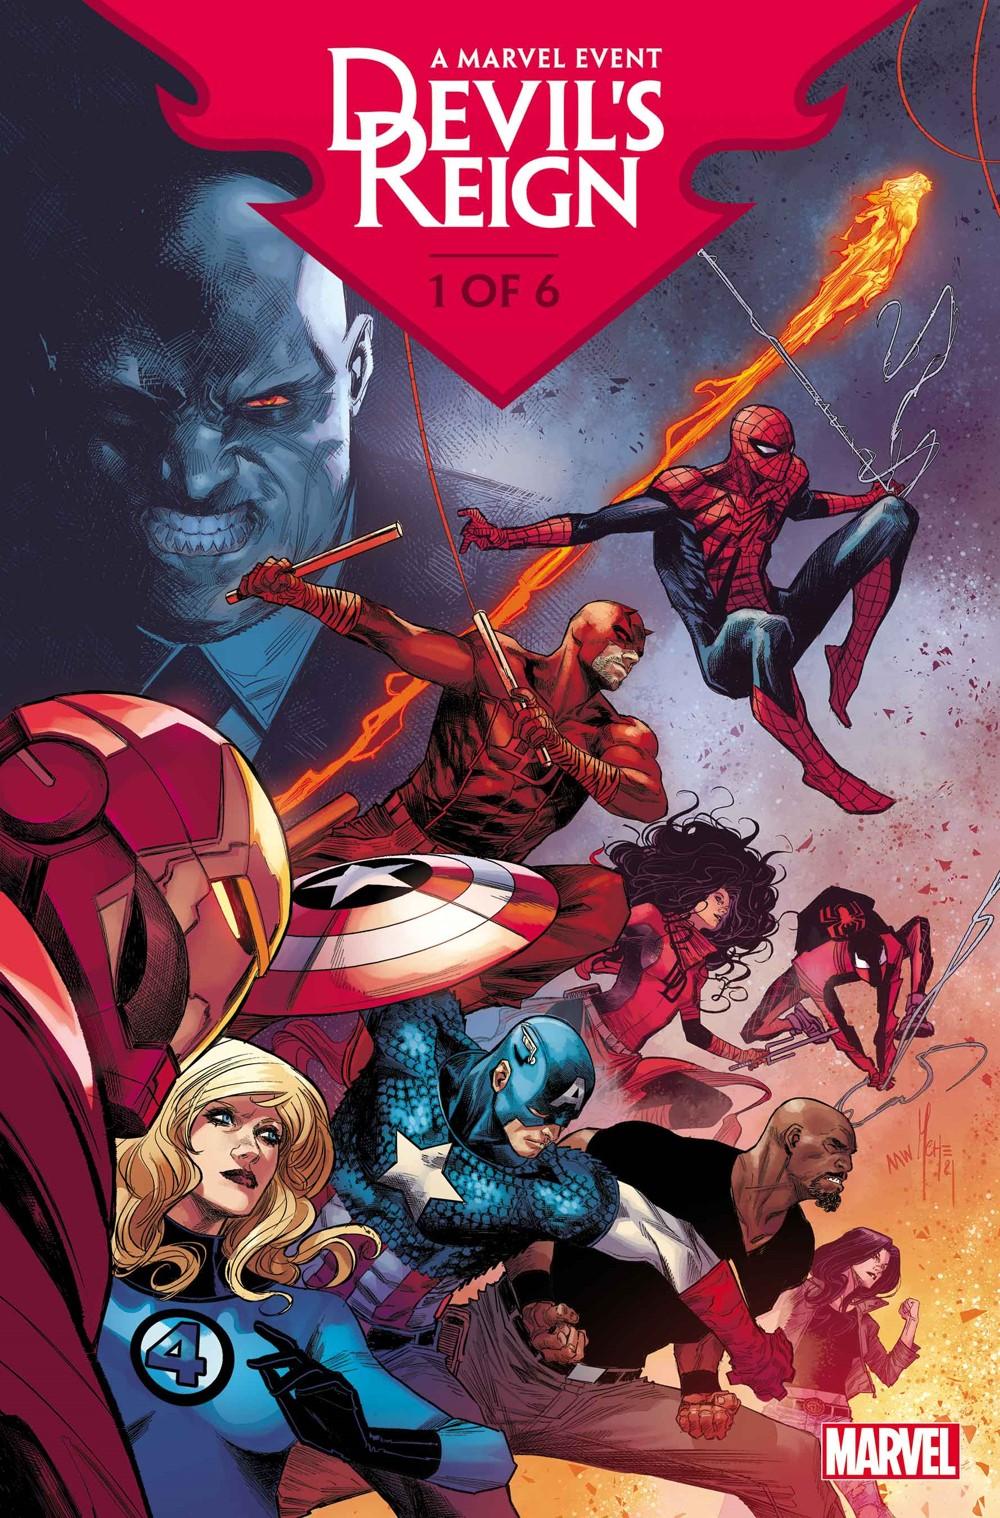 DEVILSREIGN2021001_cov-2 Marvel Comics December 2021 Solicitations